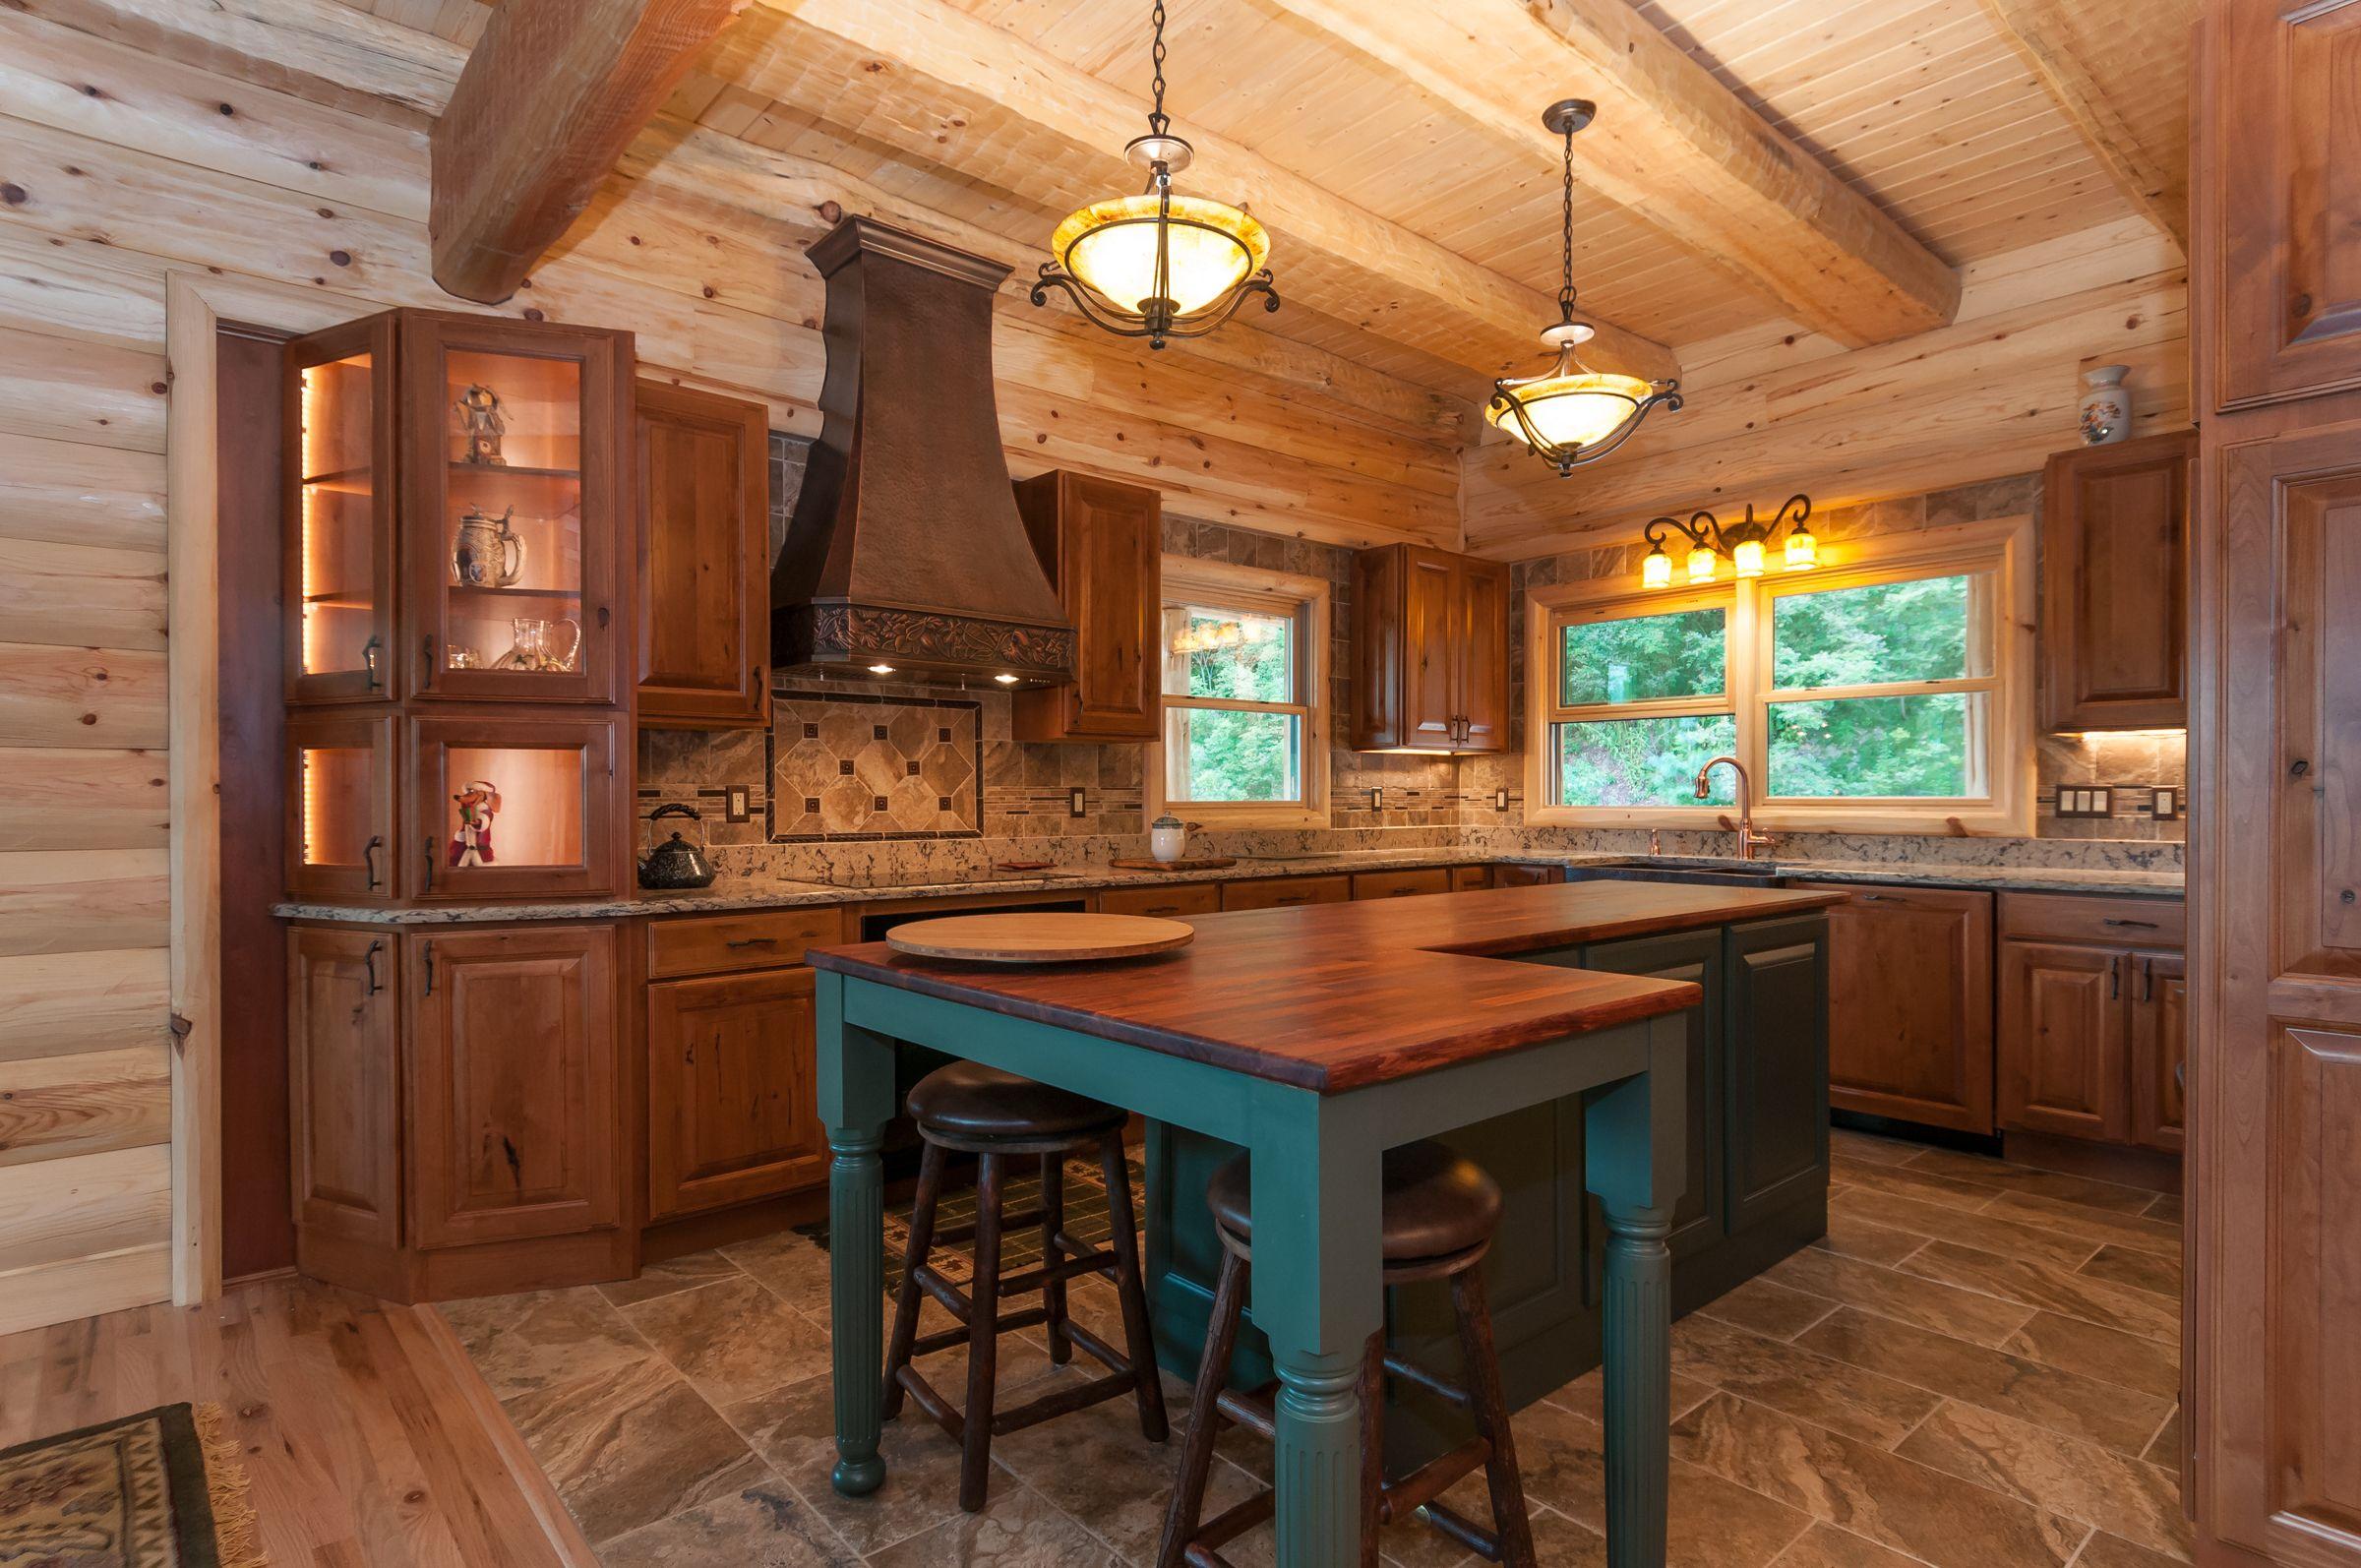 modern kitchen mountain modern mountain home kitchen ideas log cabin log cabin kitchen on kitchen ideas with island id=12966